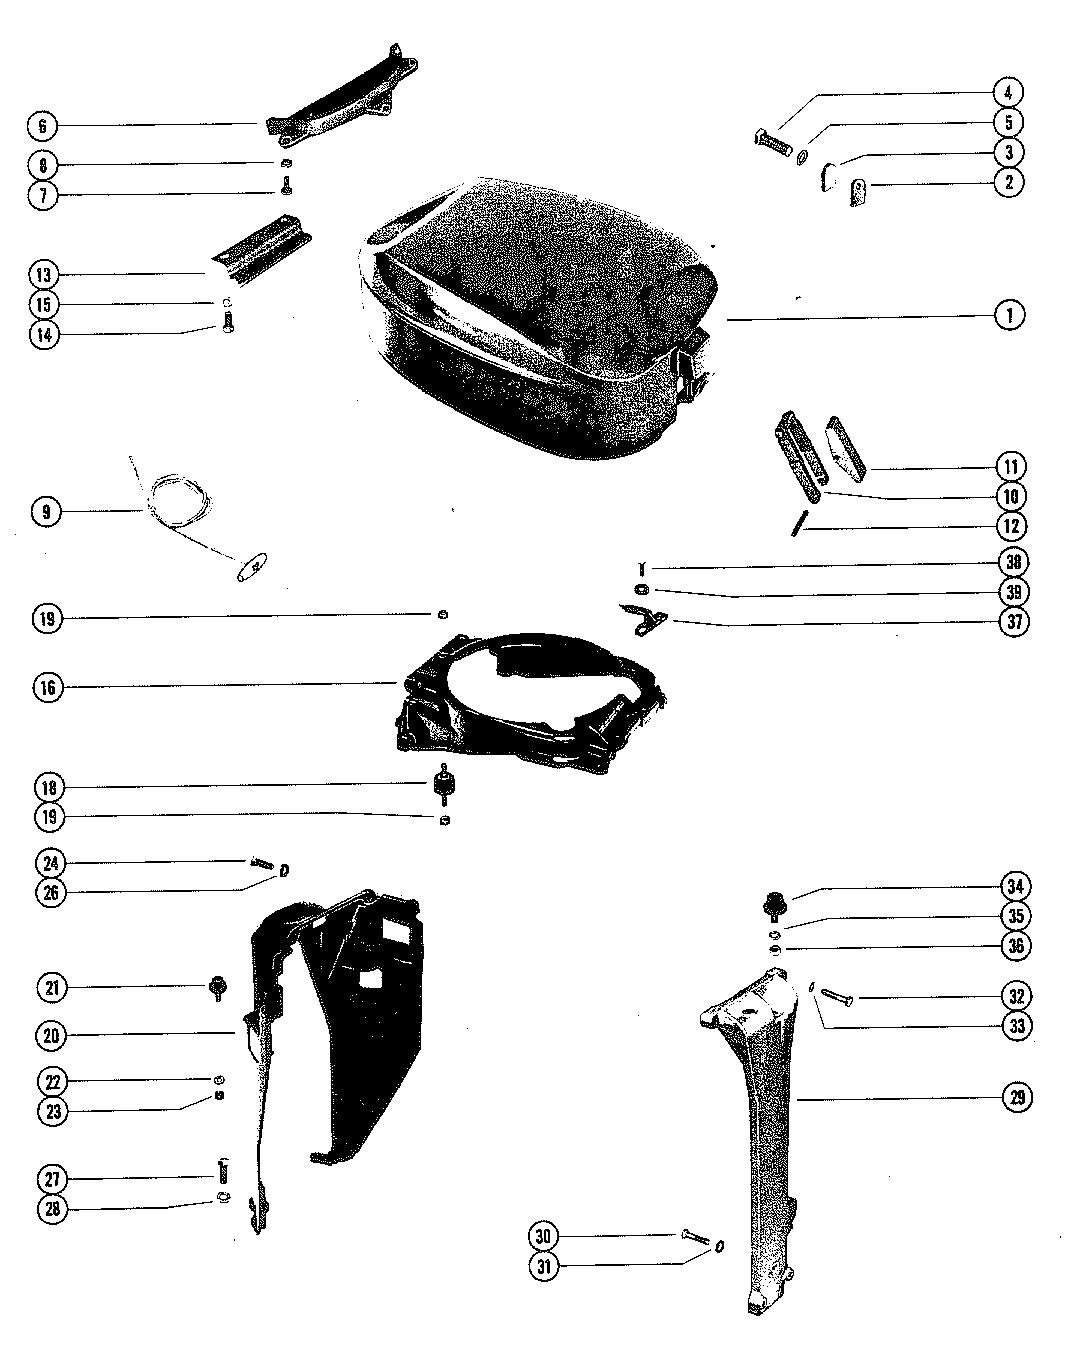 Mariner 90 6 Cyl Thru